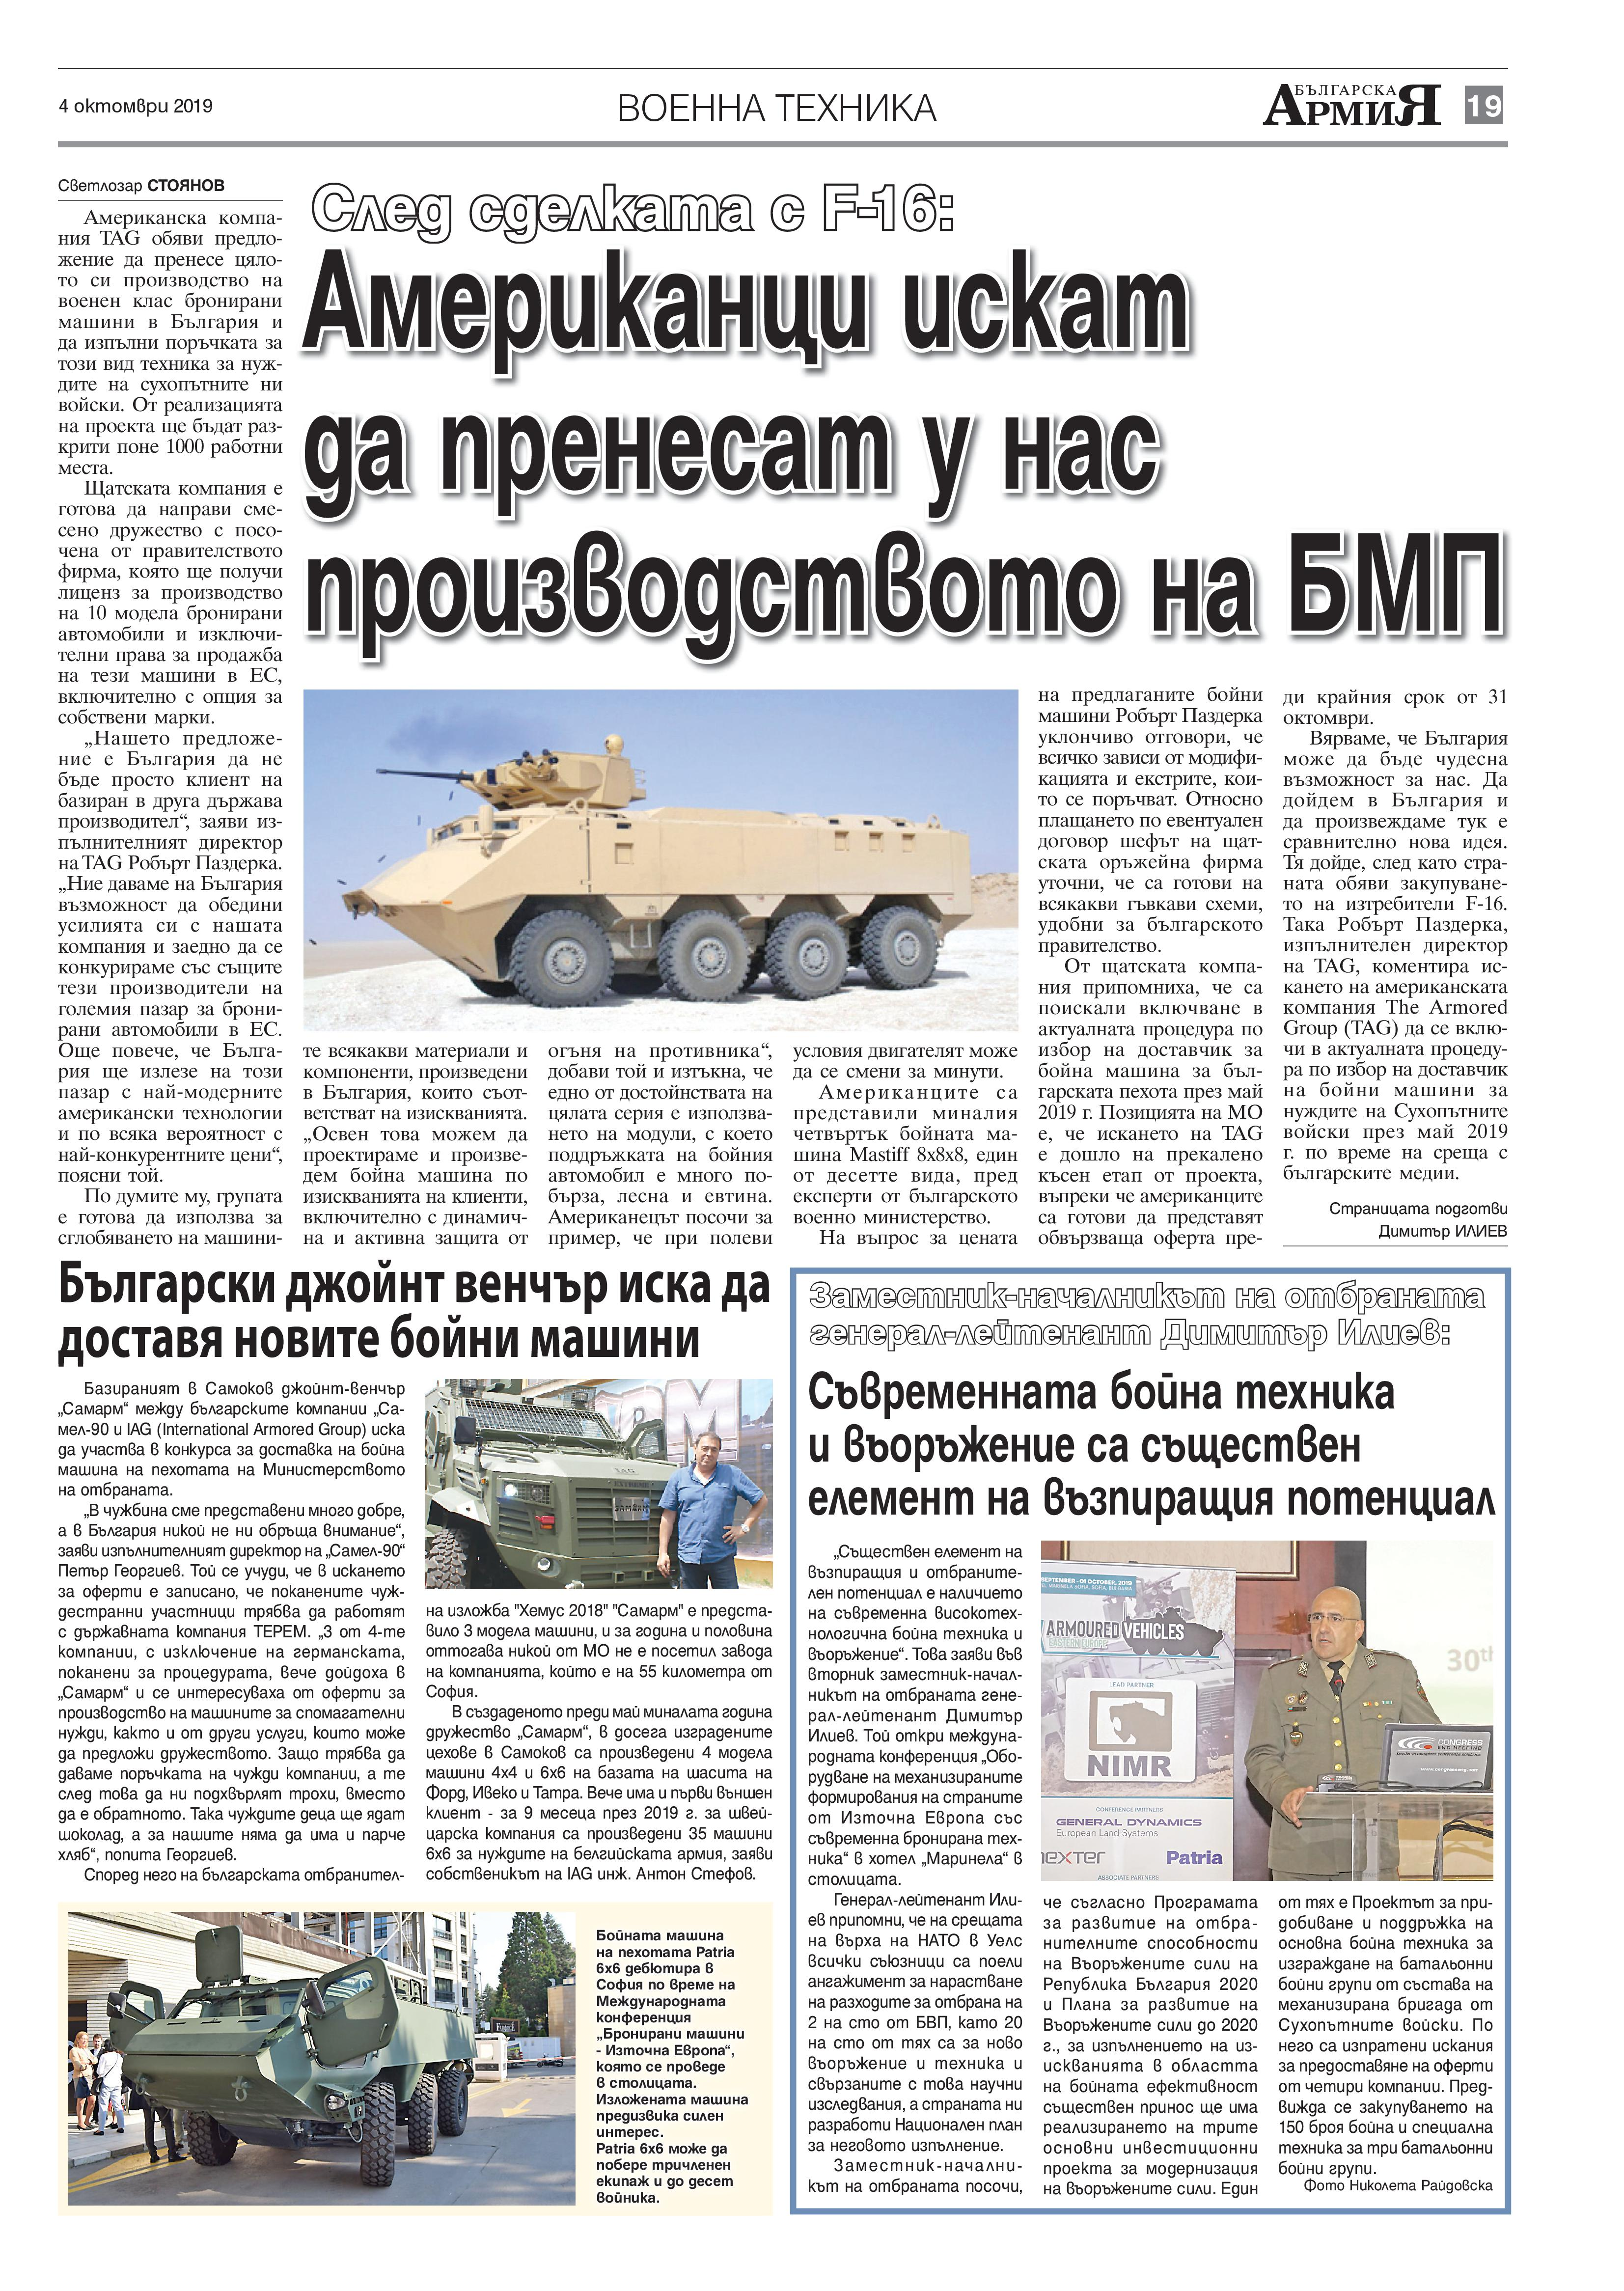 https://armymedia.bg/wp-content/uploads/2015/06/19-33.jpg